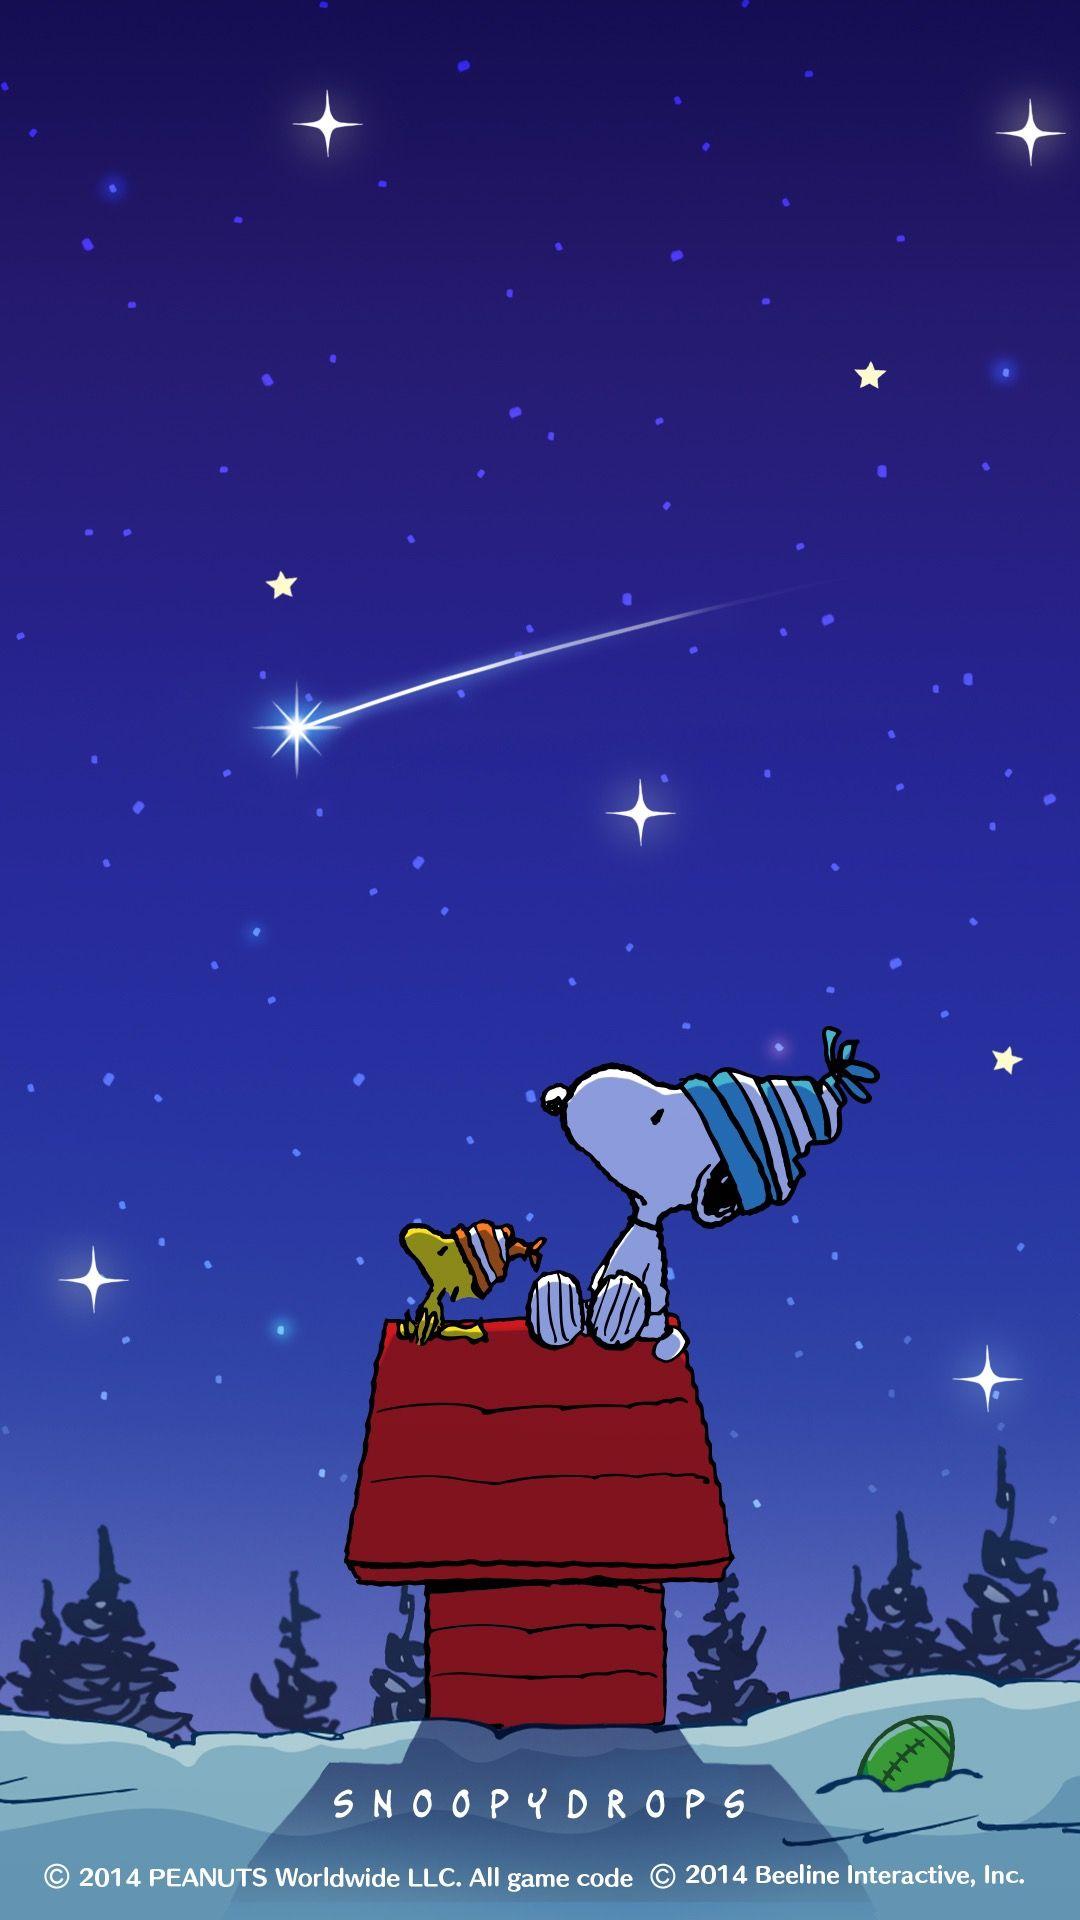 Snoopy スヌーピー 冬の夜空 冬の壁紙